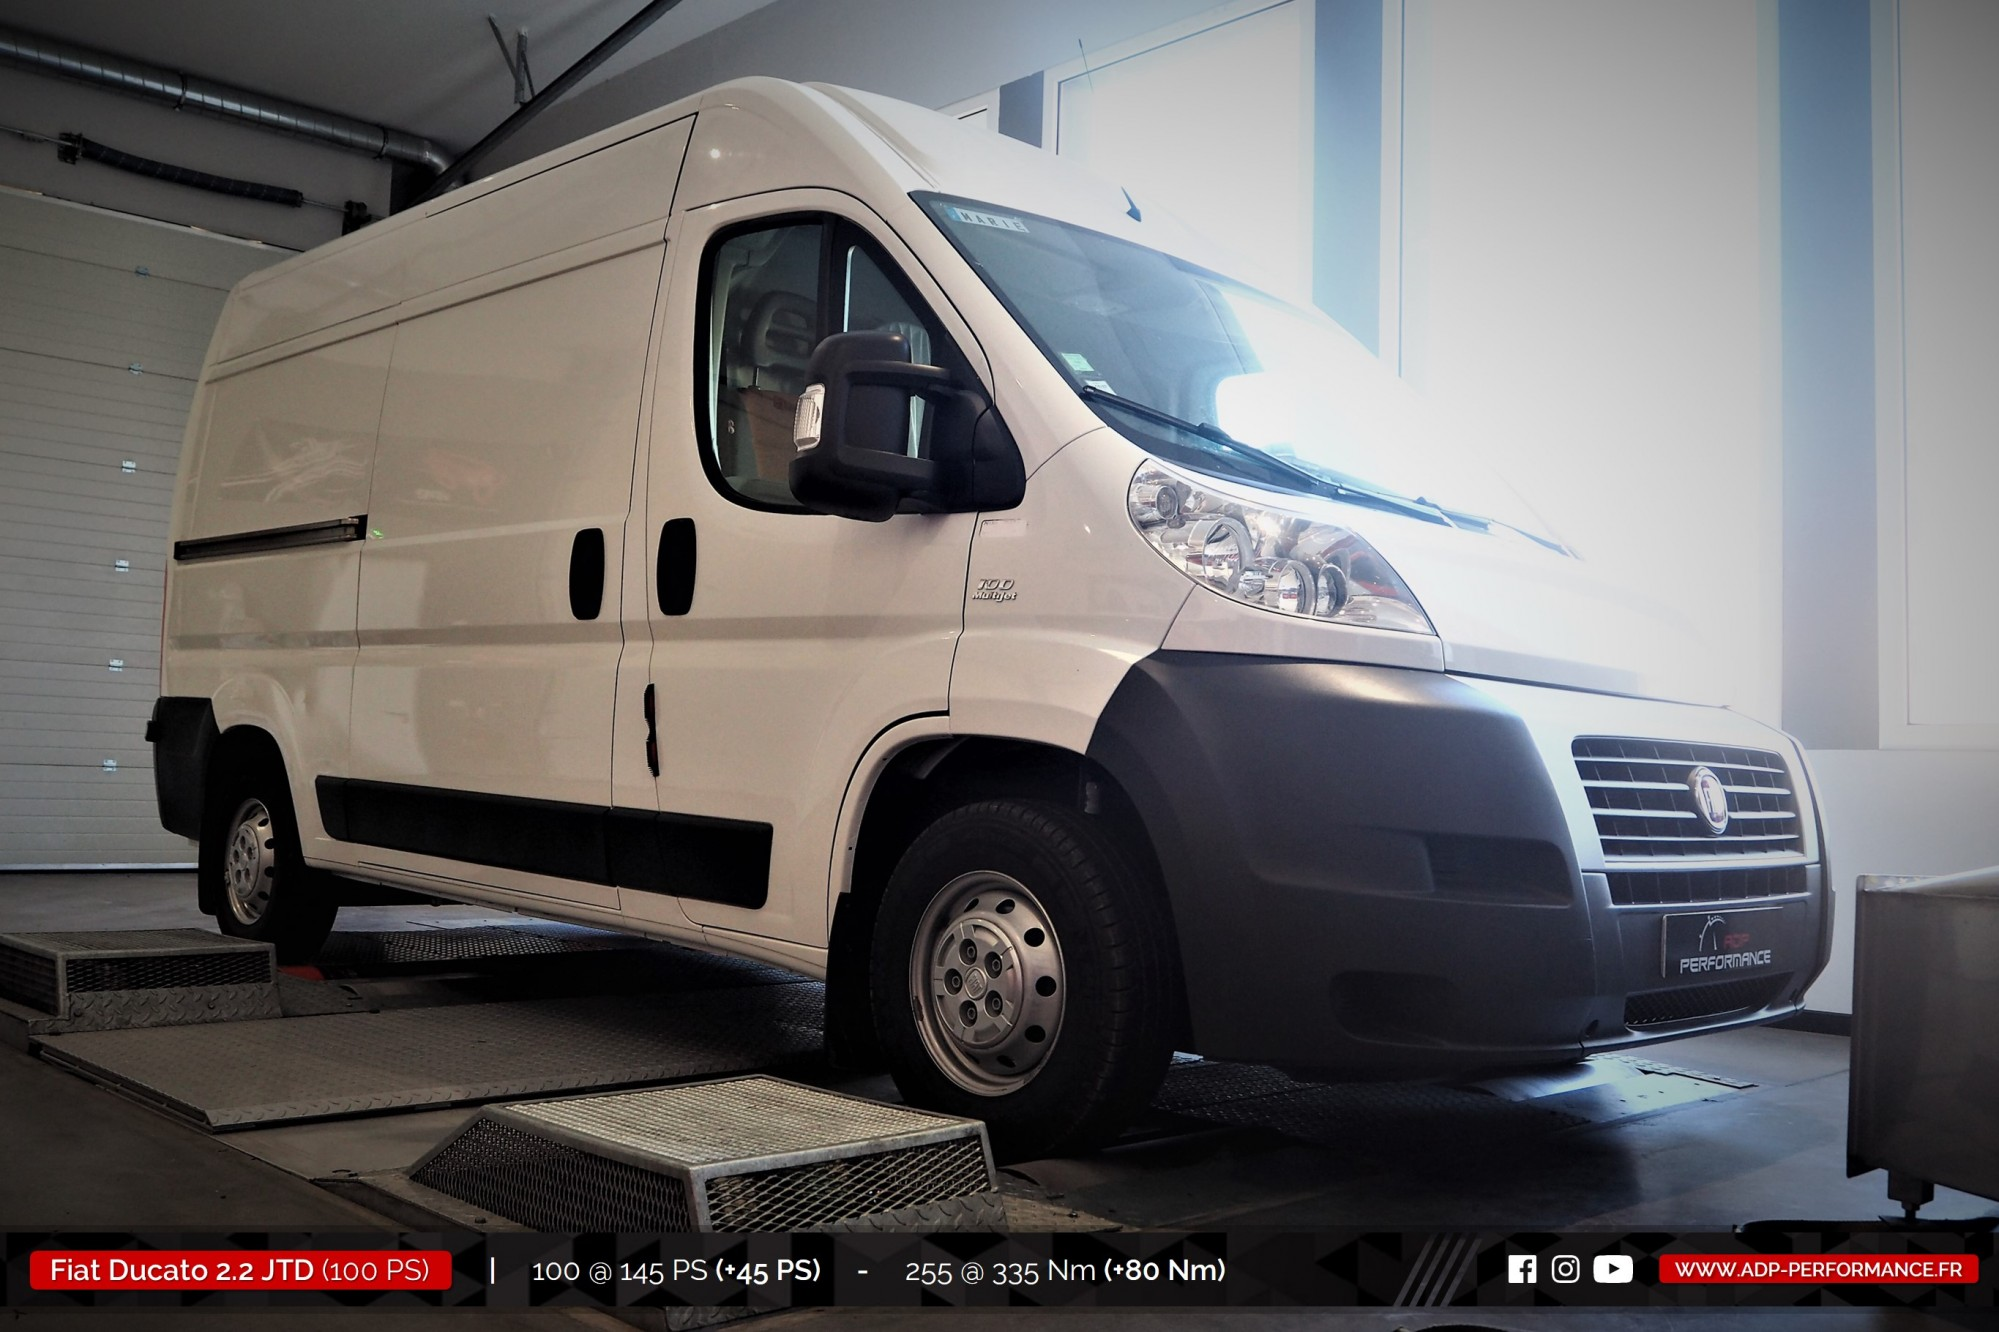 fiat ducato sept 2011 diesel 2 2 jtd 100 cv reprogrammation de votre vehicule. Black Bedroom Furniture Sets. Home Design Ideas